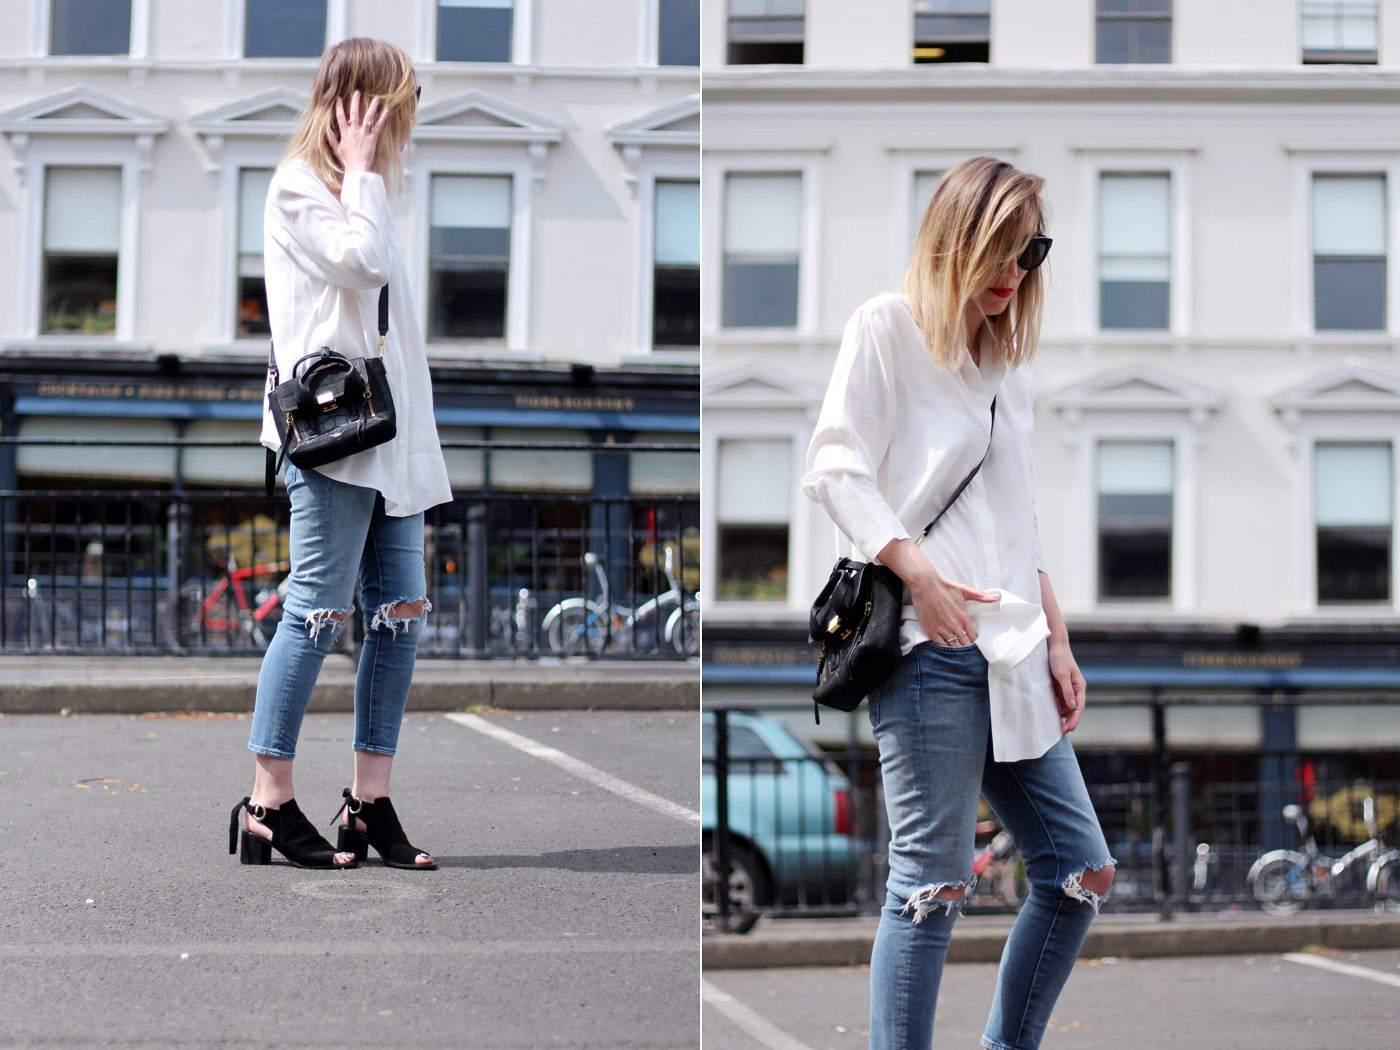 kurt-geiger-suede-peep-toe-boots-7FAM-jeans-COS-white-shirt-phillip-lim-pashli-mini-1.1